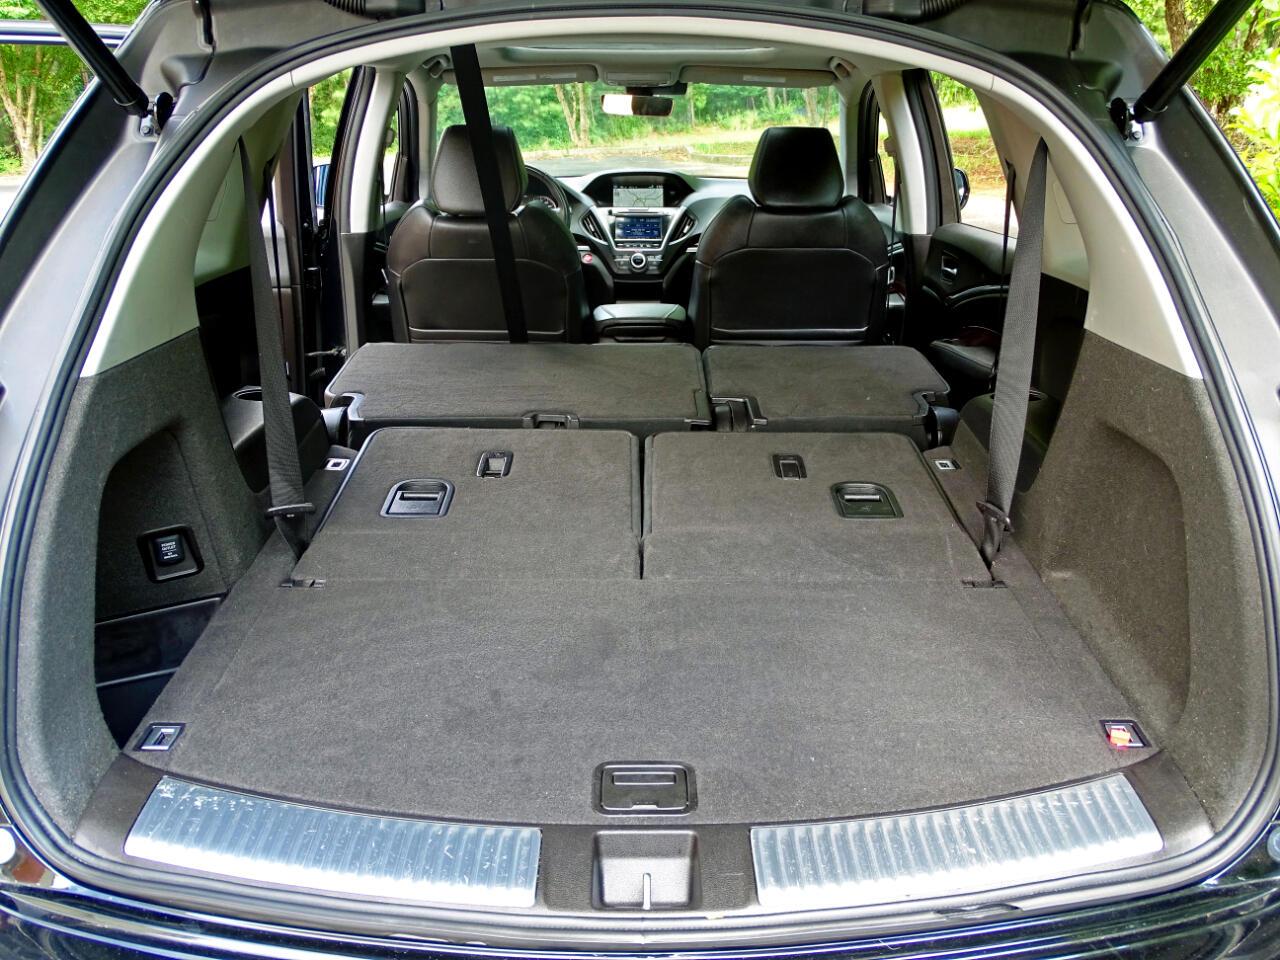 2016 Acura MDX SH-AWD 4dr w/Tech/AcuraWatch Plus